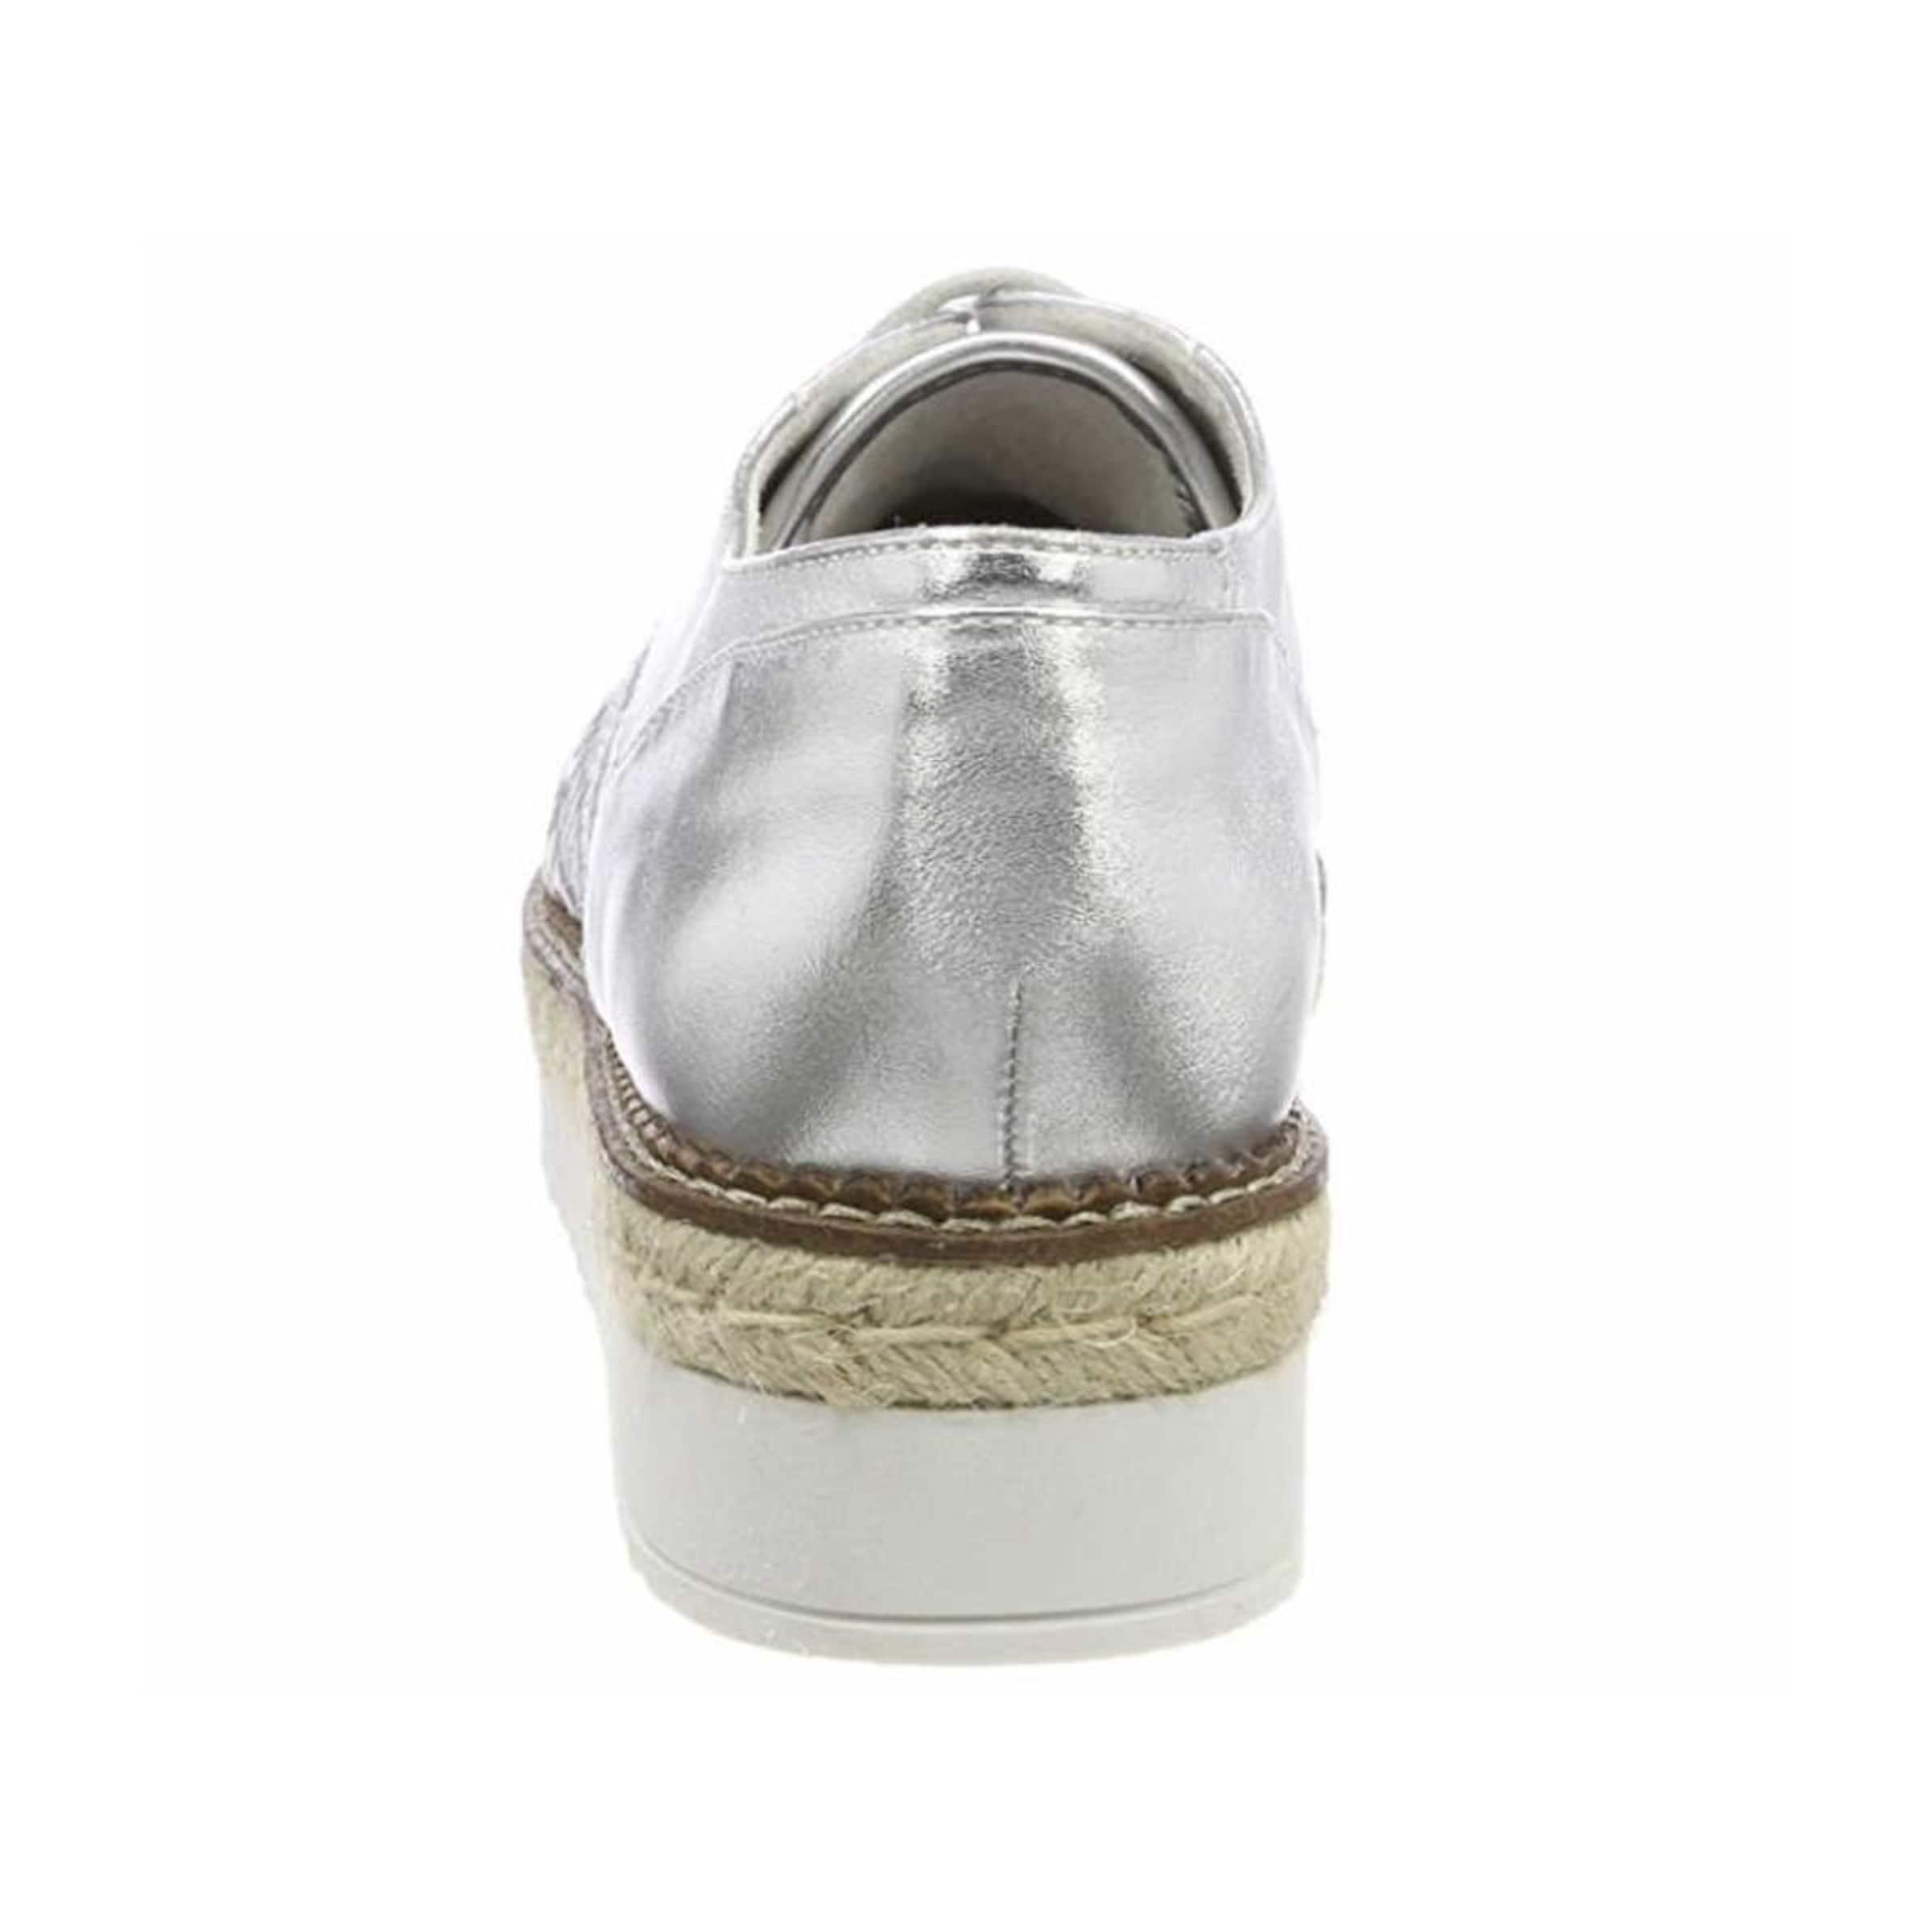 Silber In Tamaris Schnürschuhe Schnürschuhe Tamaris Rj53LA4